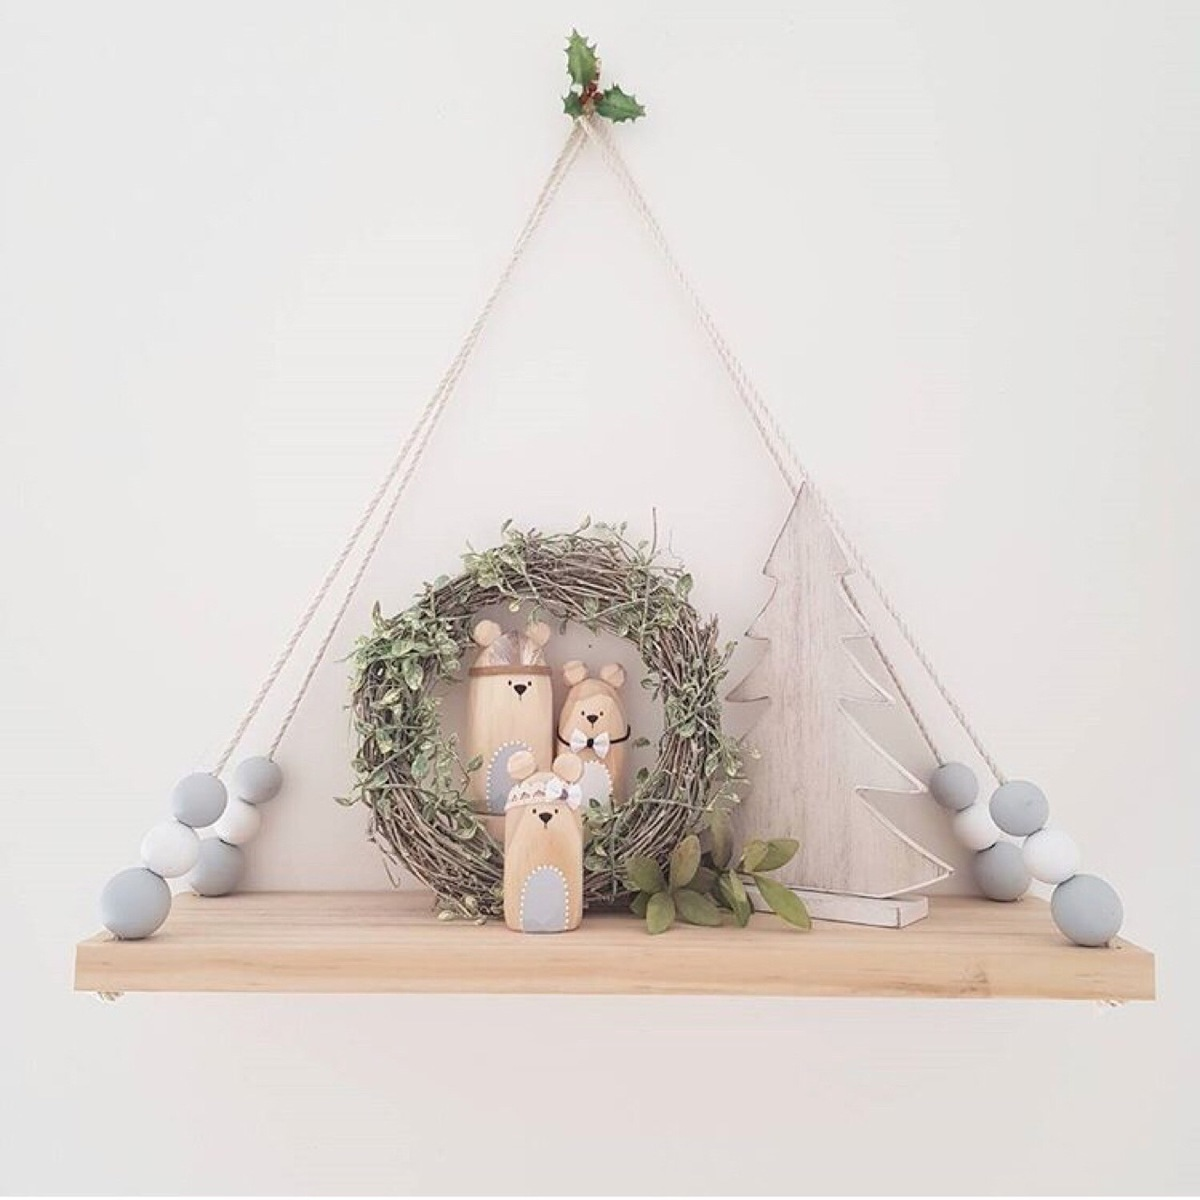 Nordic Style Scandinavia Original Wood Bead Wall Shelf For Books Flower Pot Kid Room Decoration Photography Prop Hanging Shelves